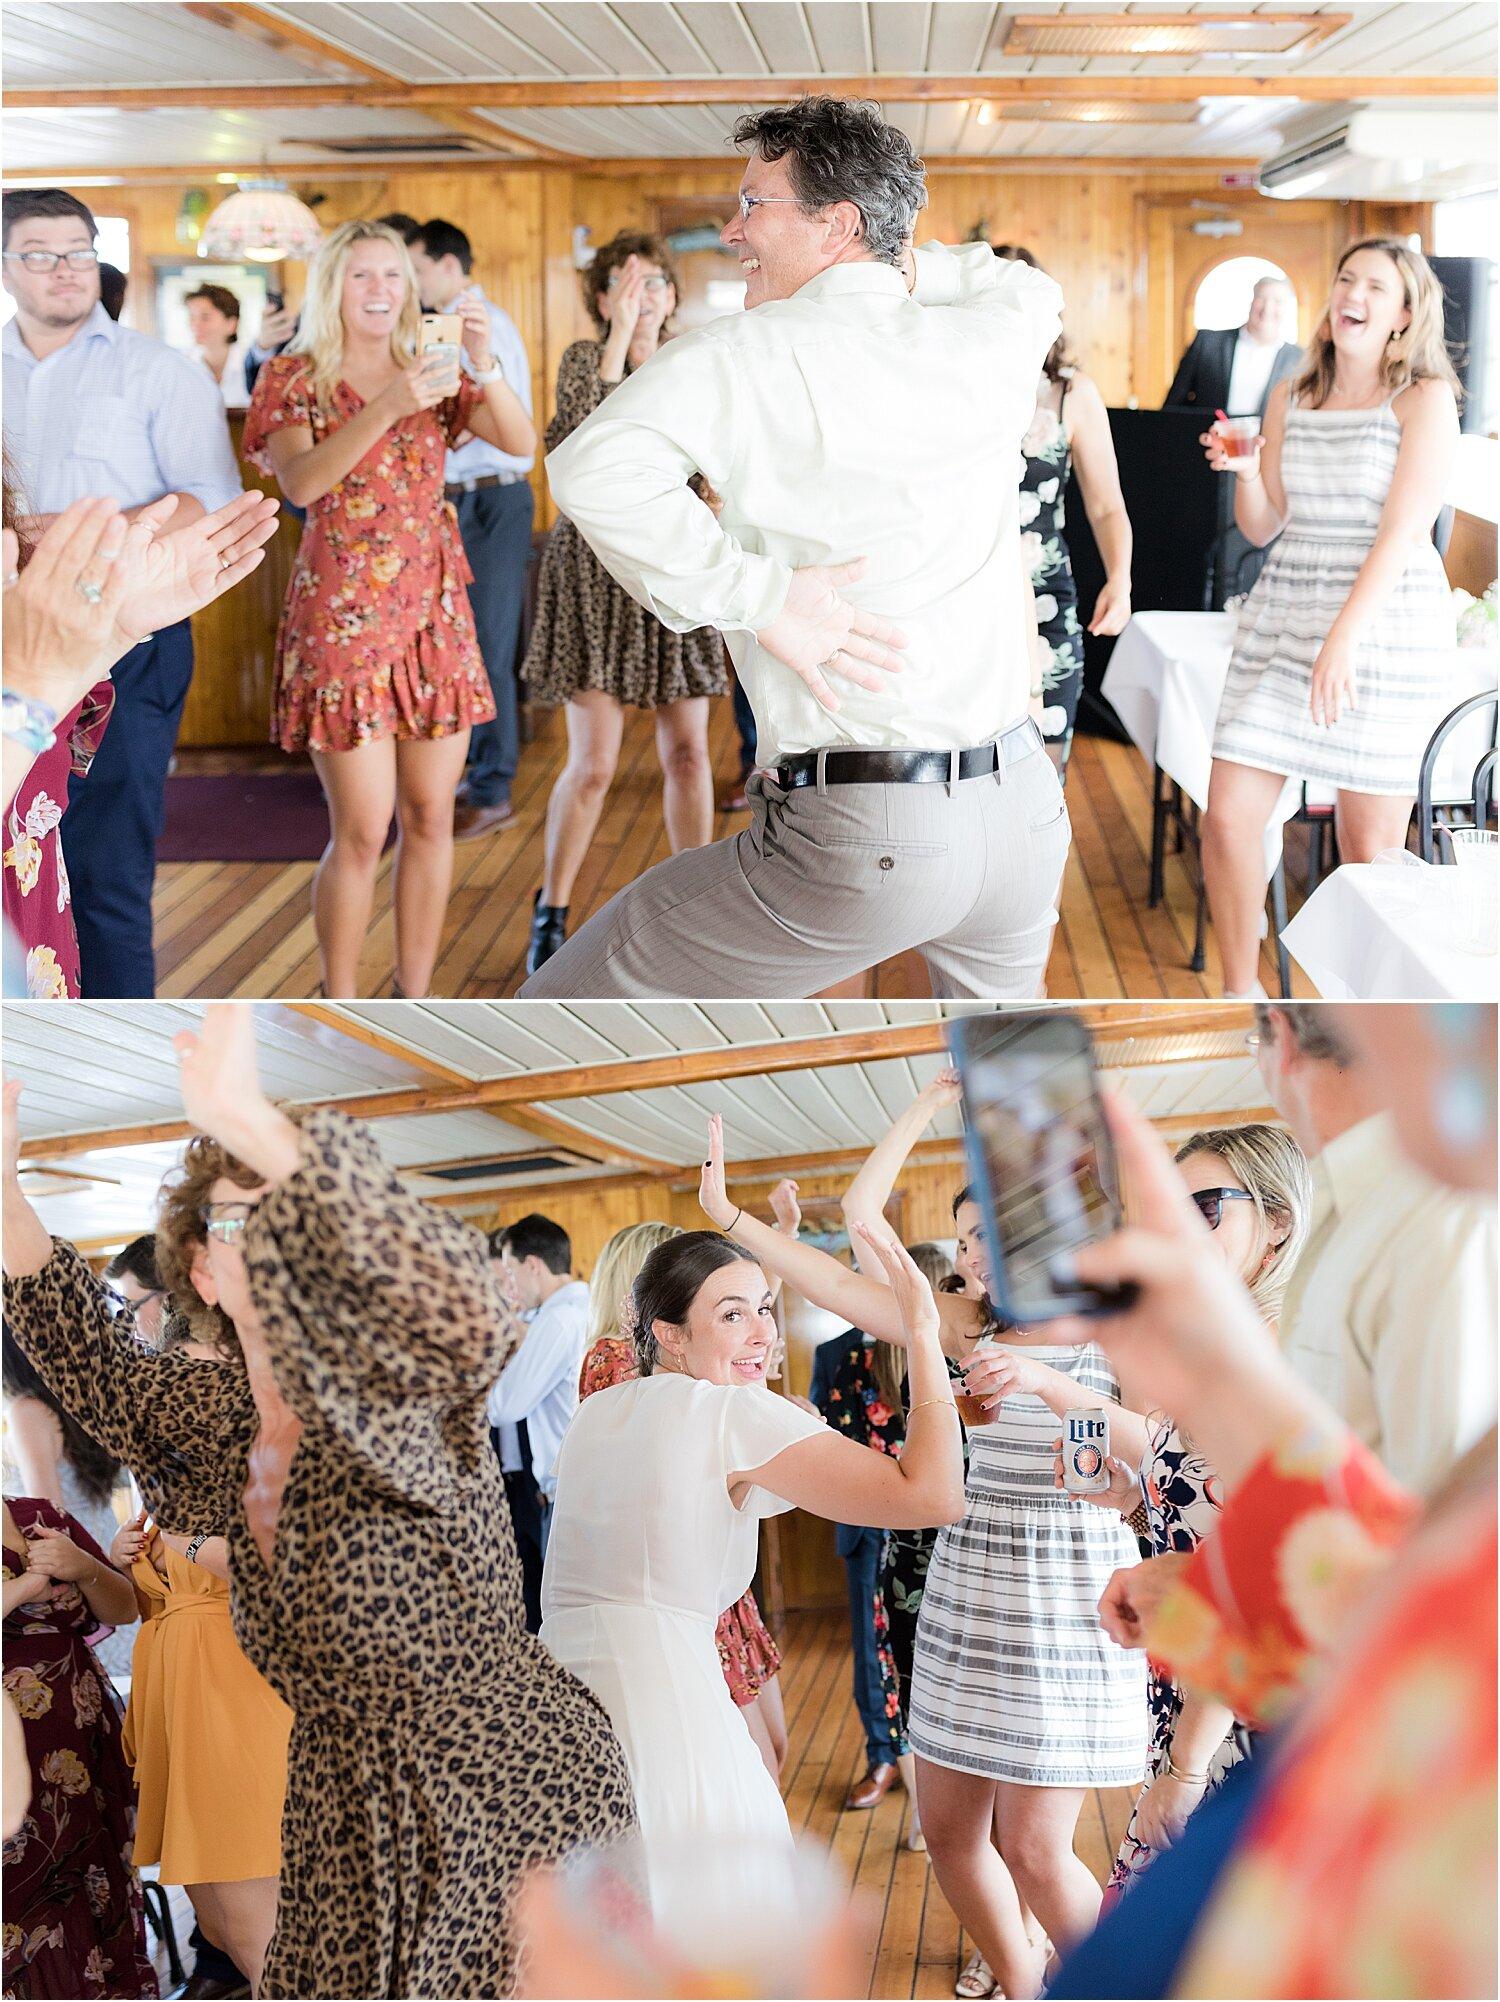 River Queen Wedding Photos in Brielle NJ